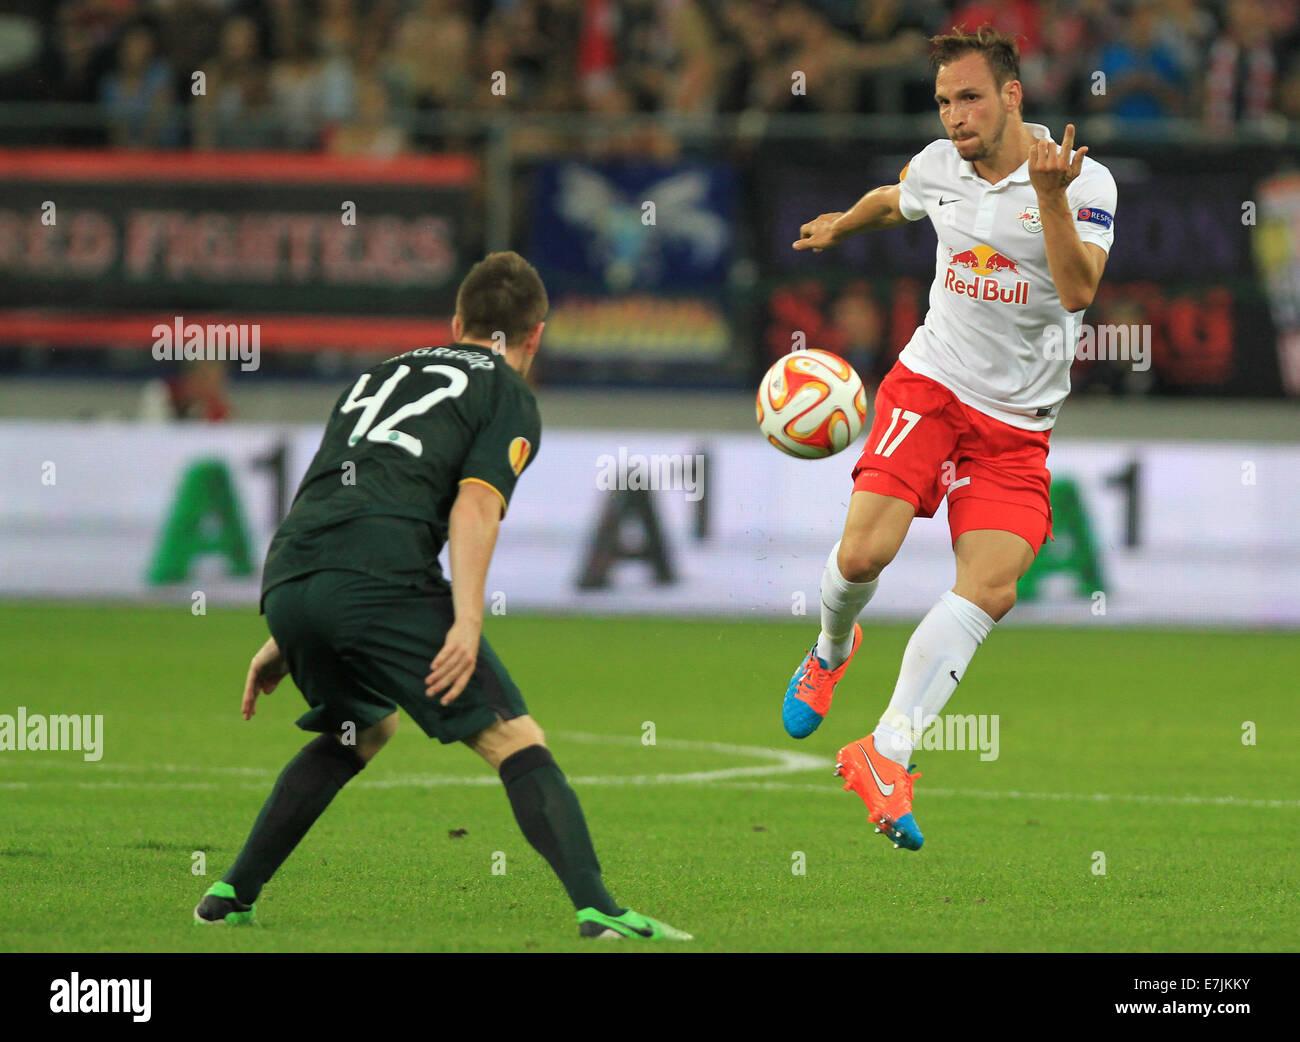 Salzburg, Austria. 18th Sep, 2014.Salzburg's Andreas Ulmer (r) vies for the ball with Celtic's Callum McGregor - Stock Image